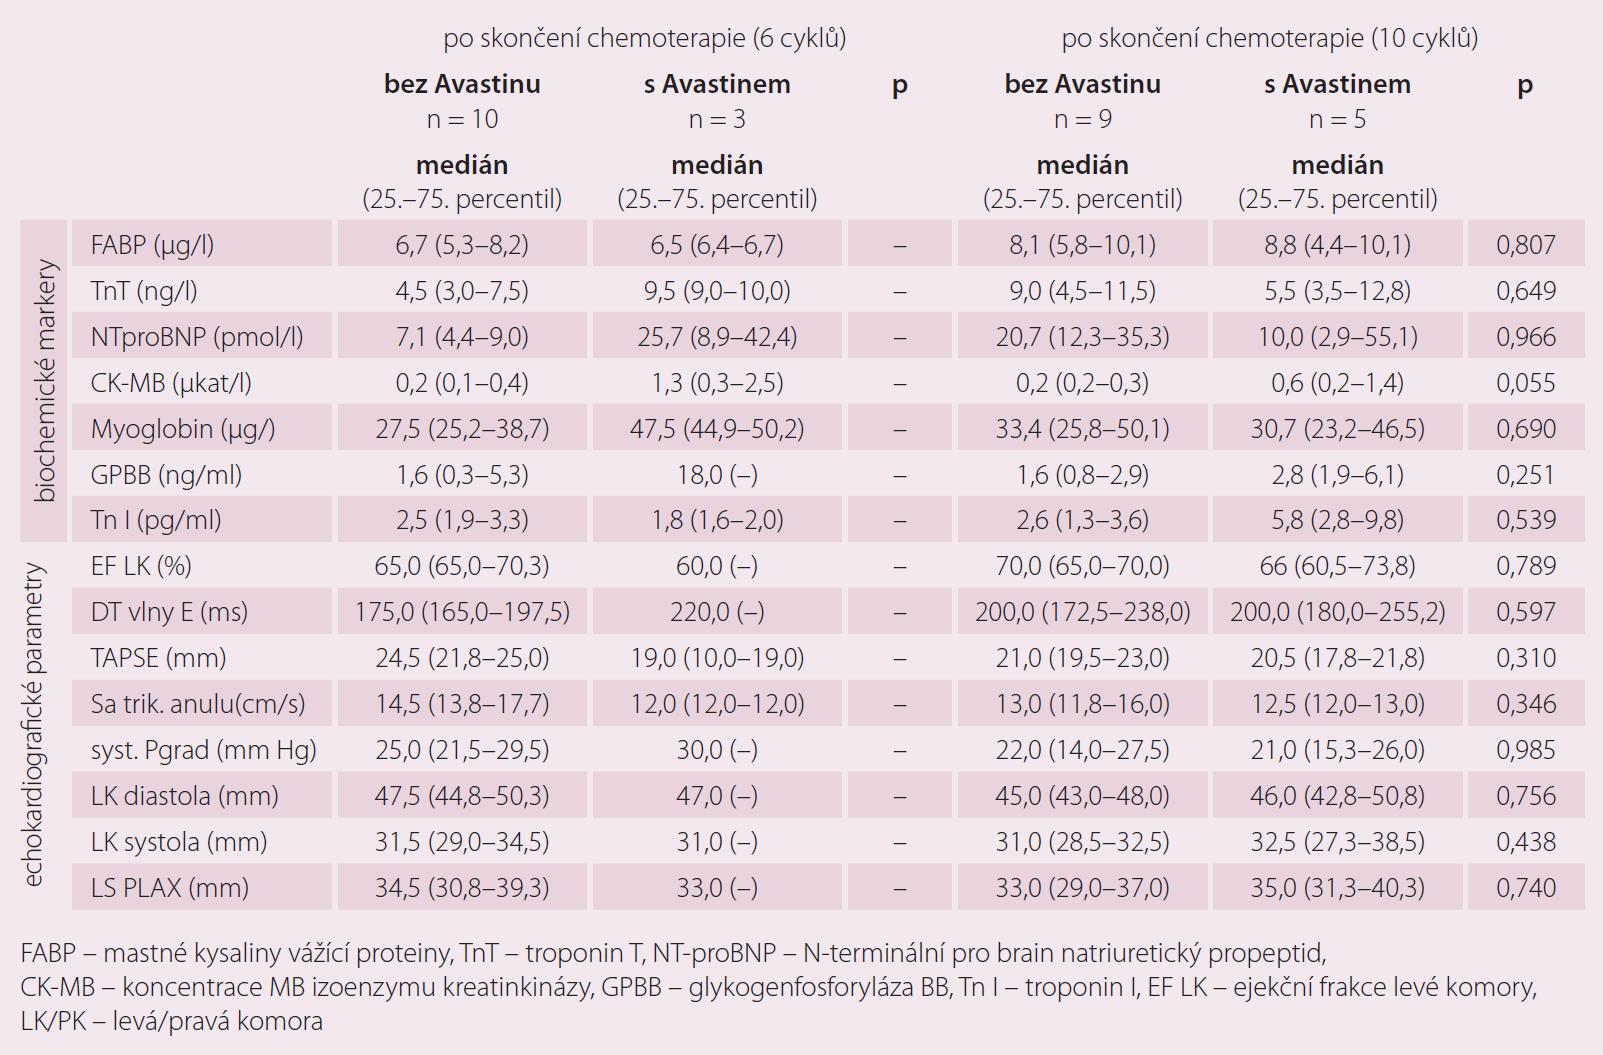 Markery kardiotoxicity v závislosti na podání chemoterapie 1. linie.